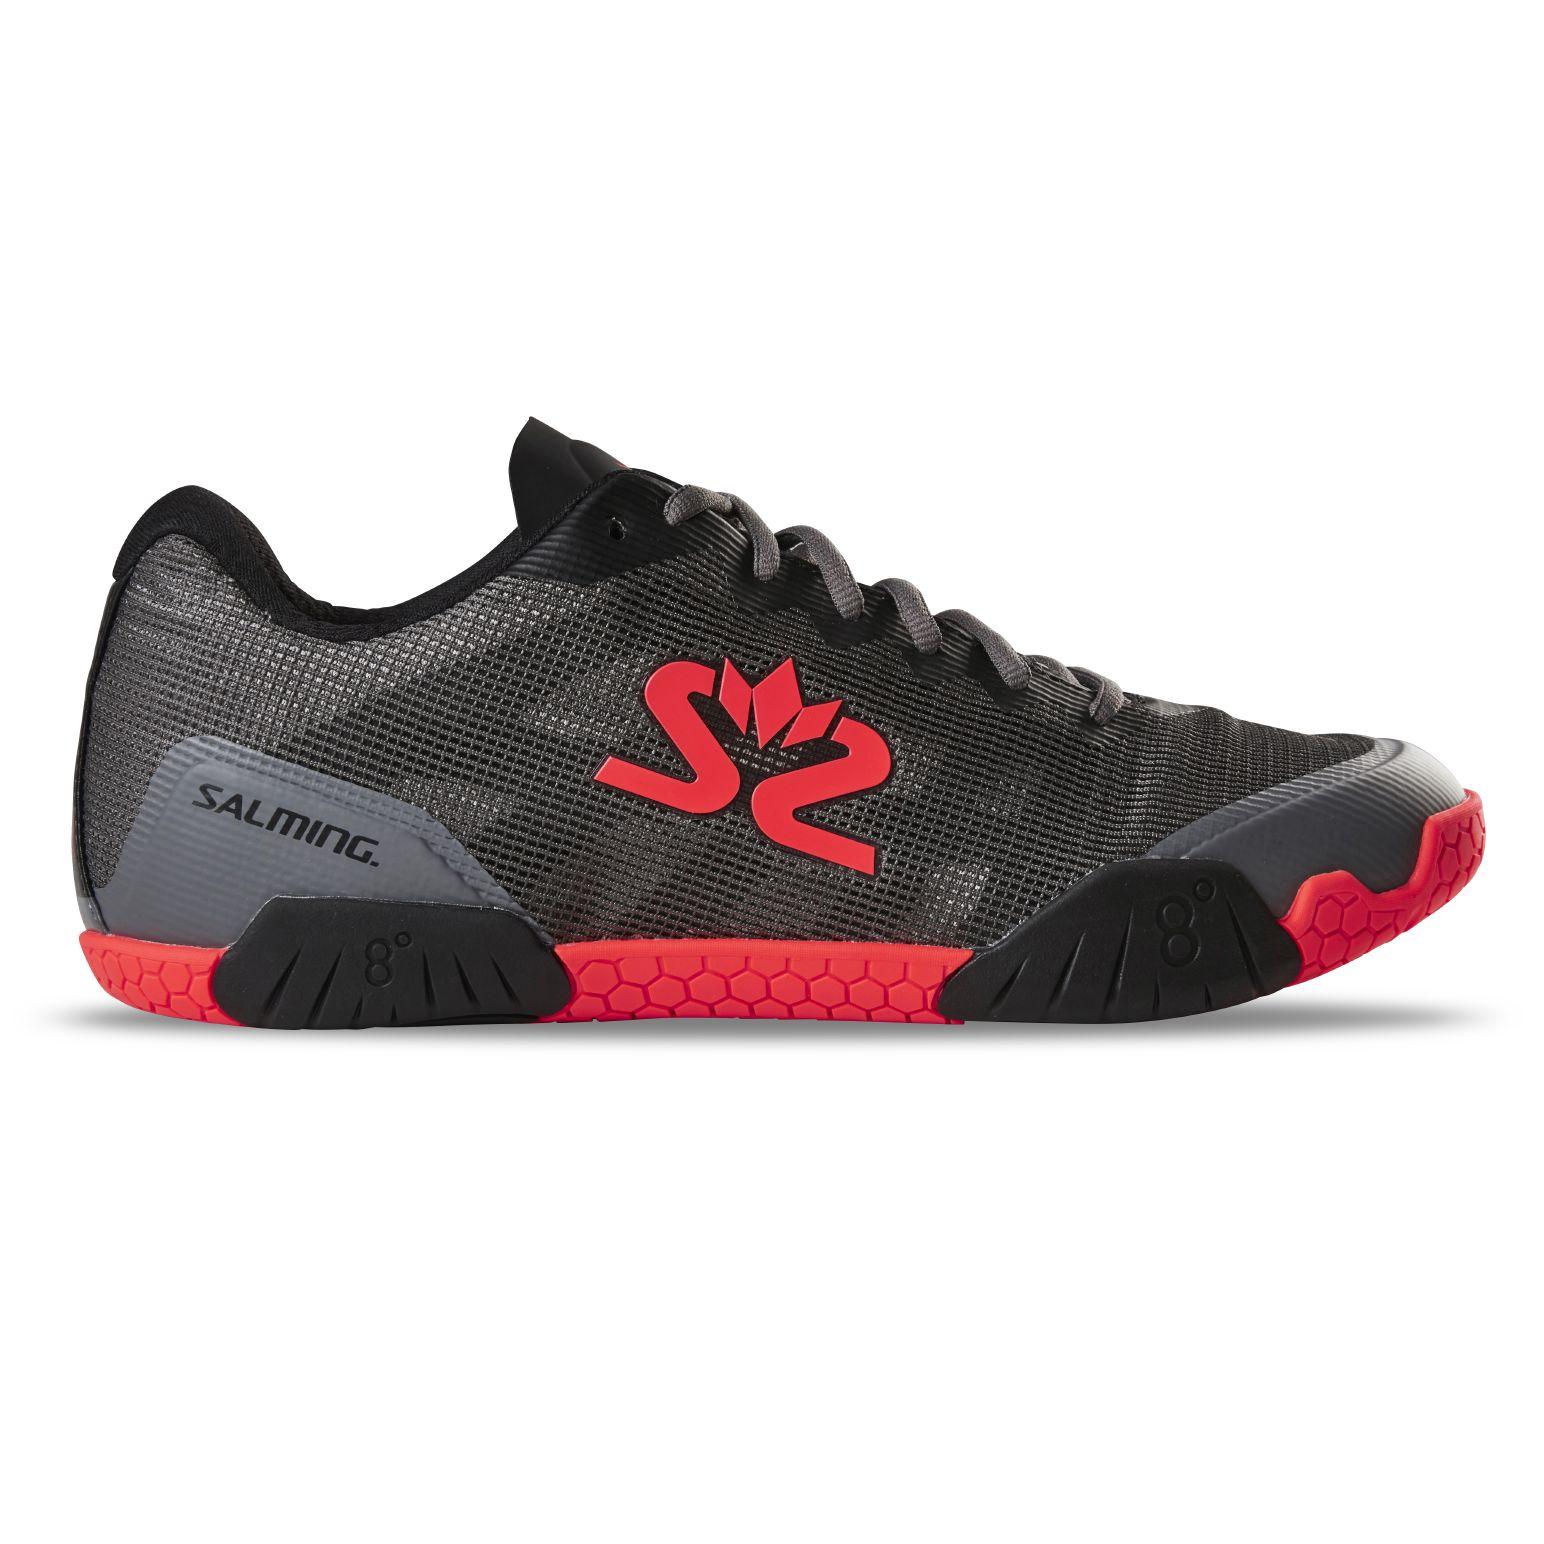 Salming Hawk Shoe Men GunMetal/Red 12,5 UK - 48 2/3 EUR - 31,5 cm